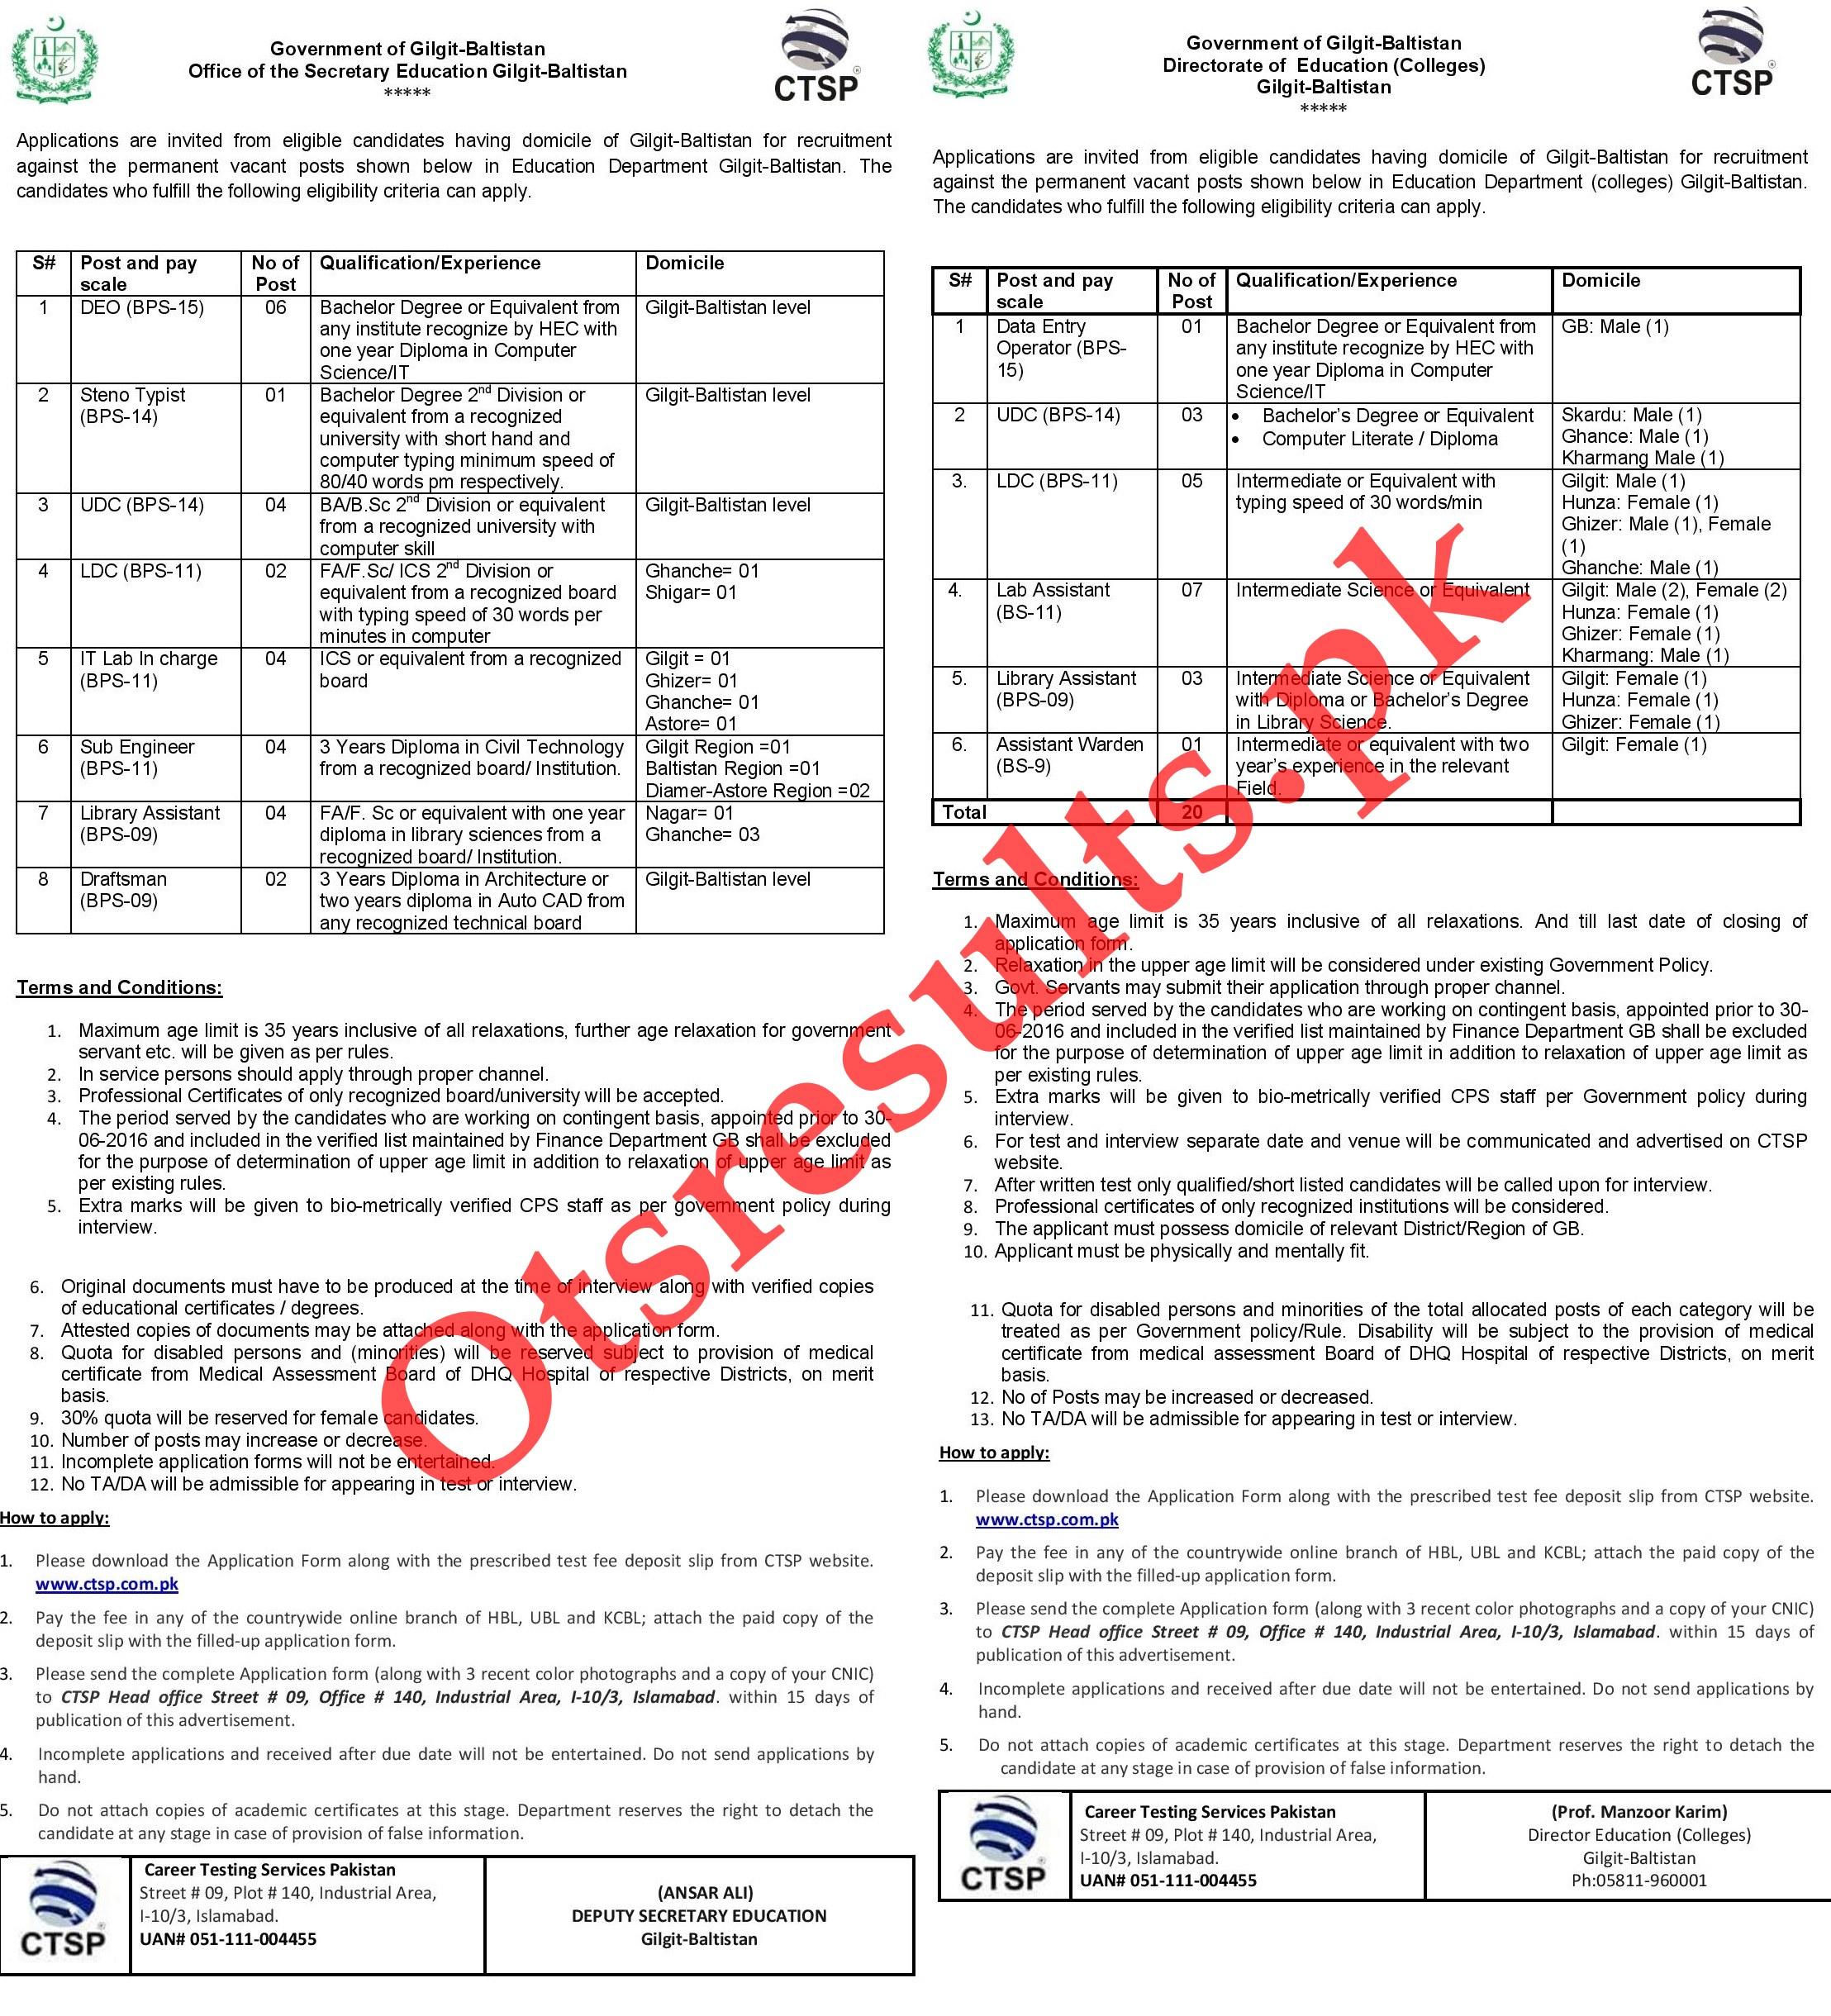 Education Department Colleges Gilgit Baltistan 2021 CTSP Roll No Slip